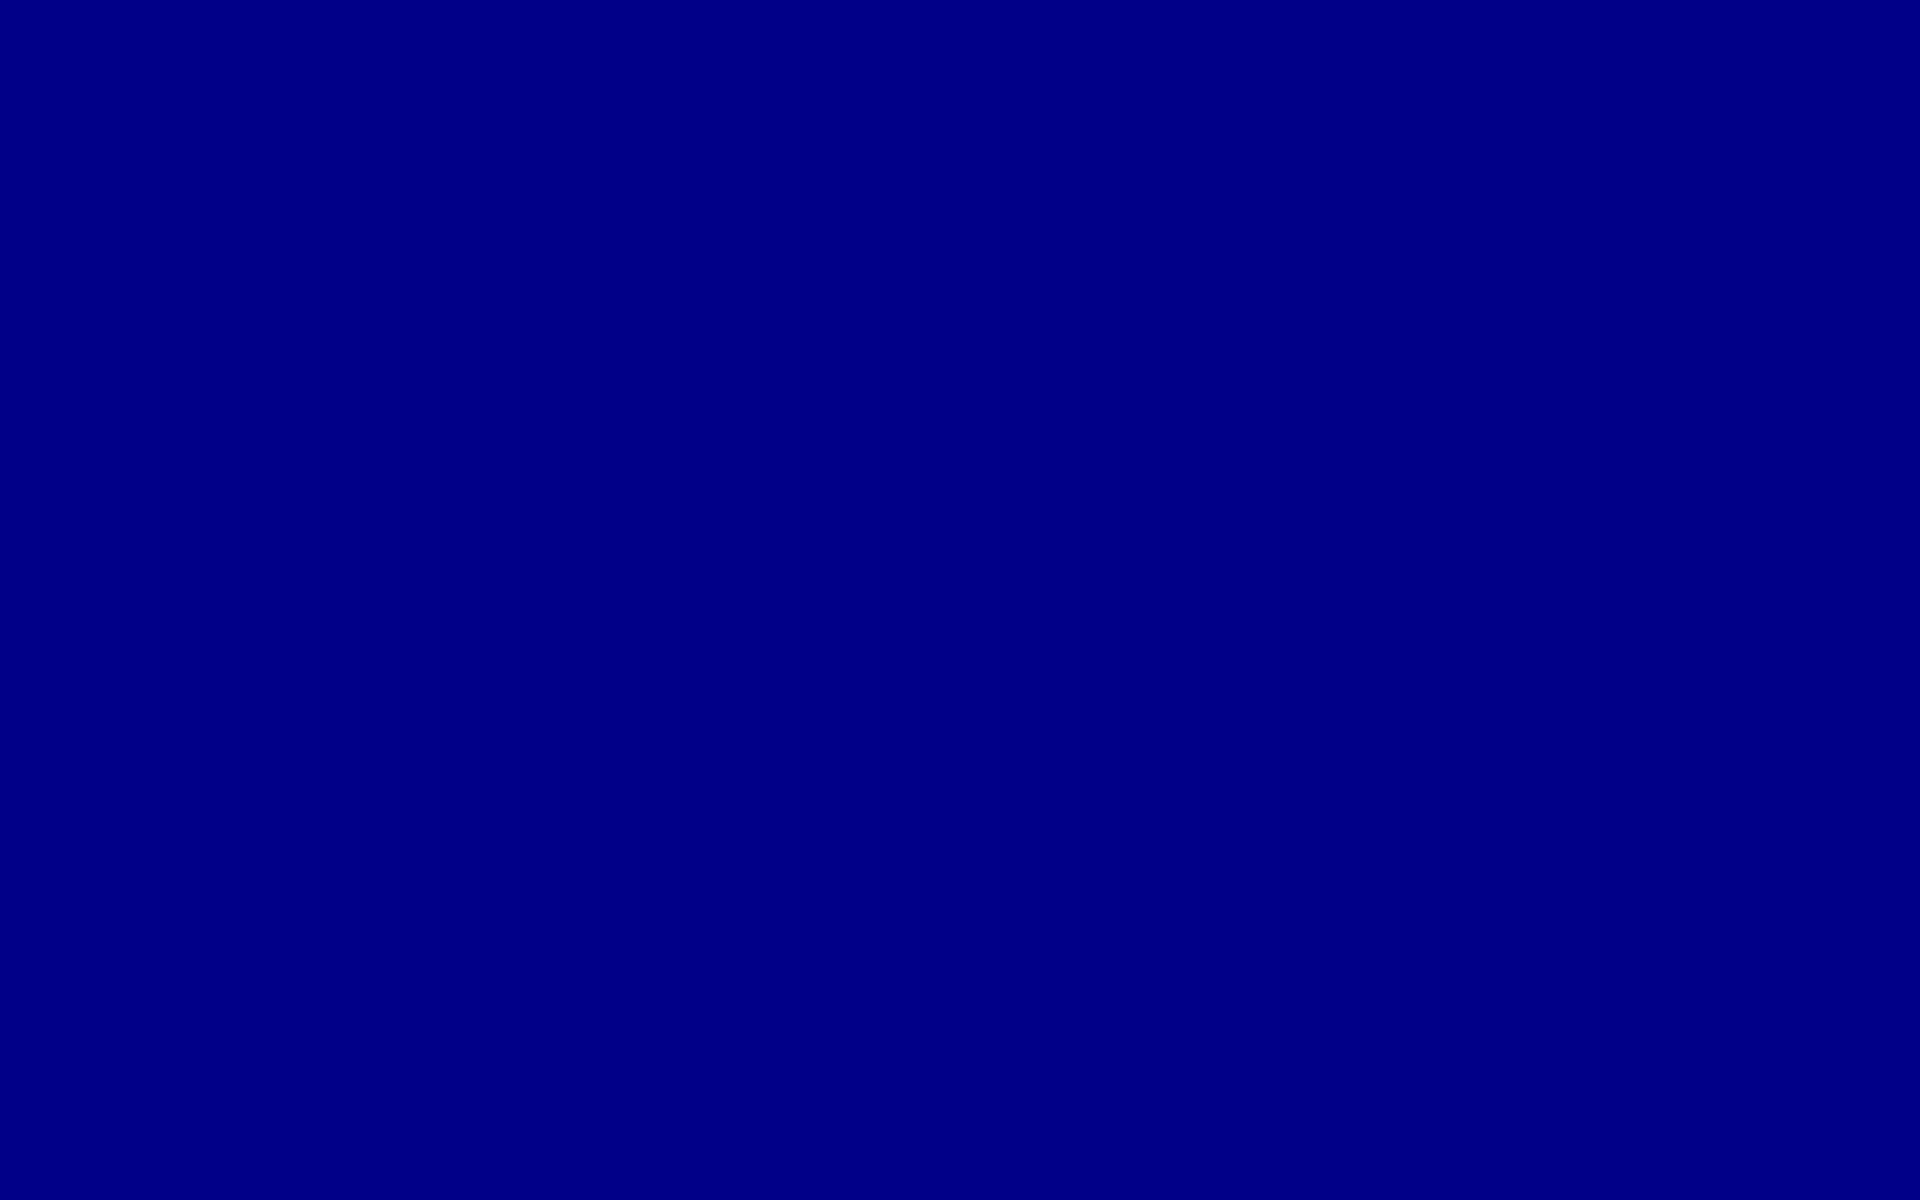 1920x1200 Dark Blue Solid Color Background